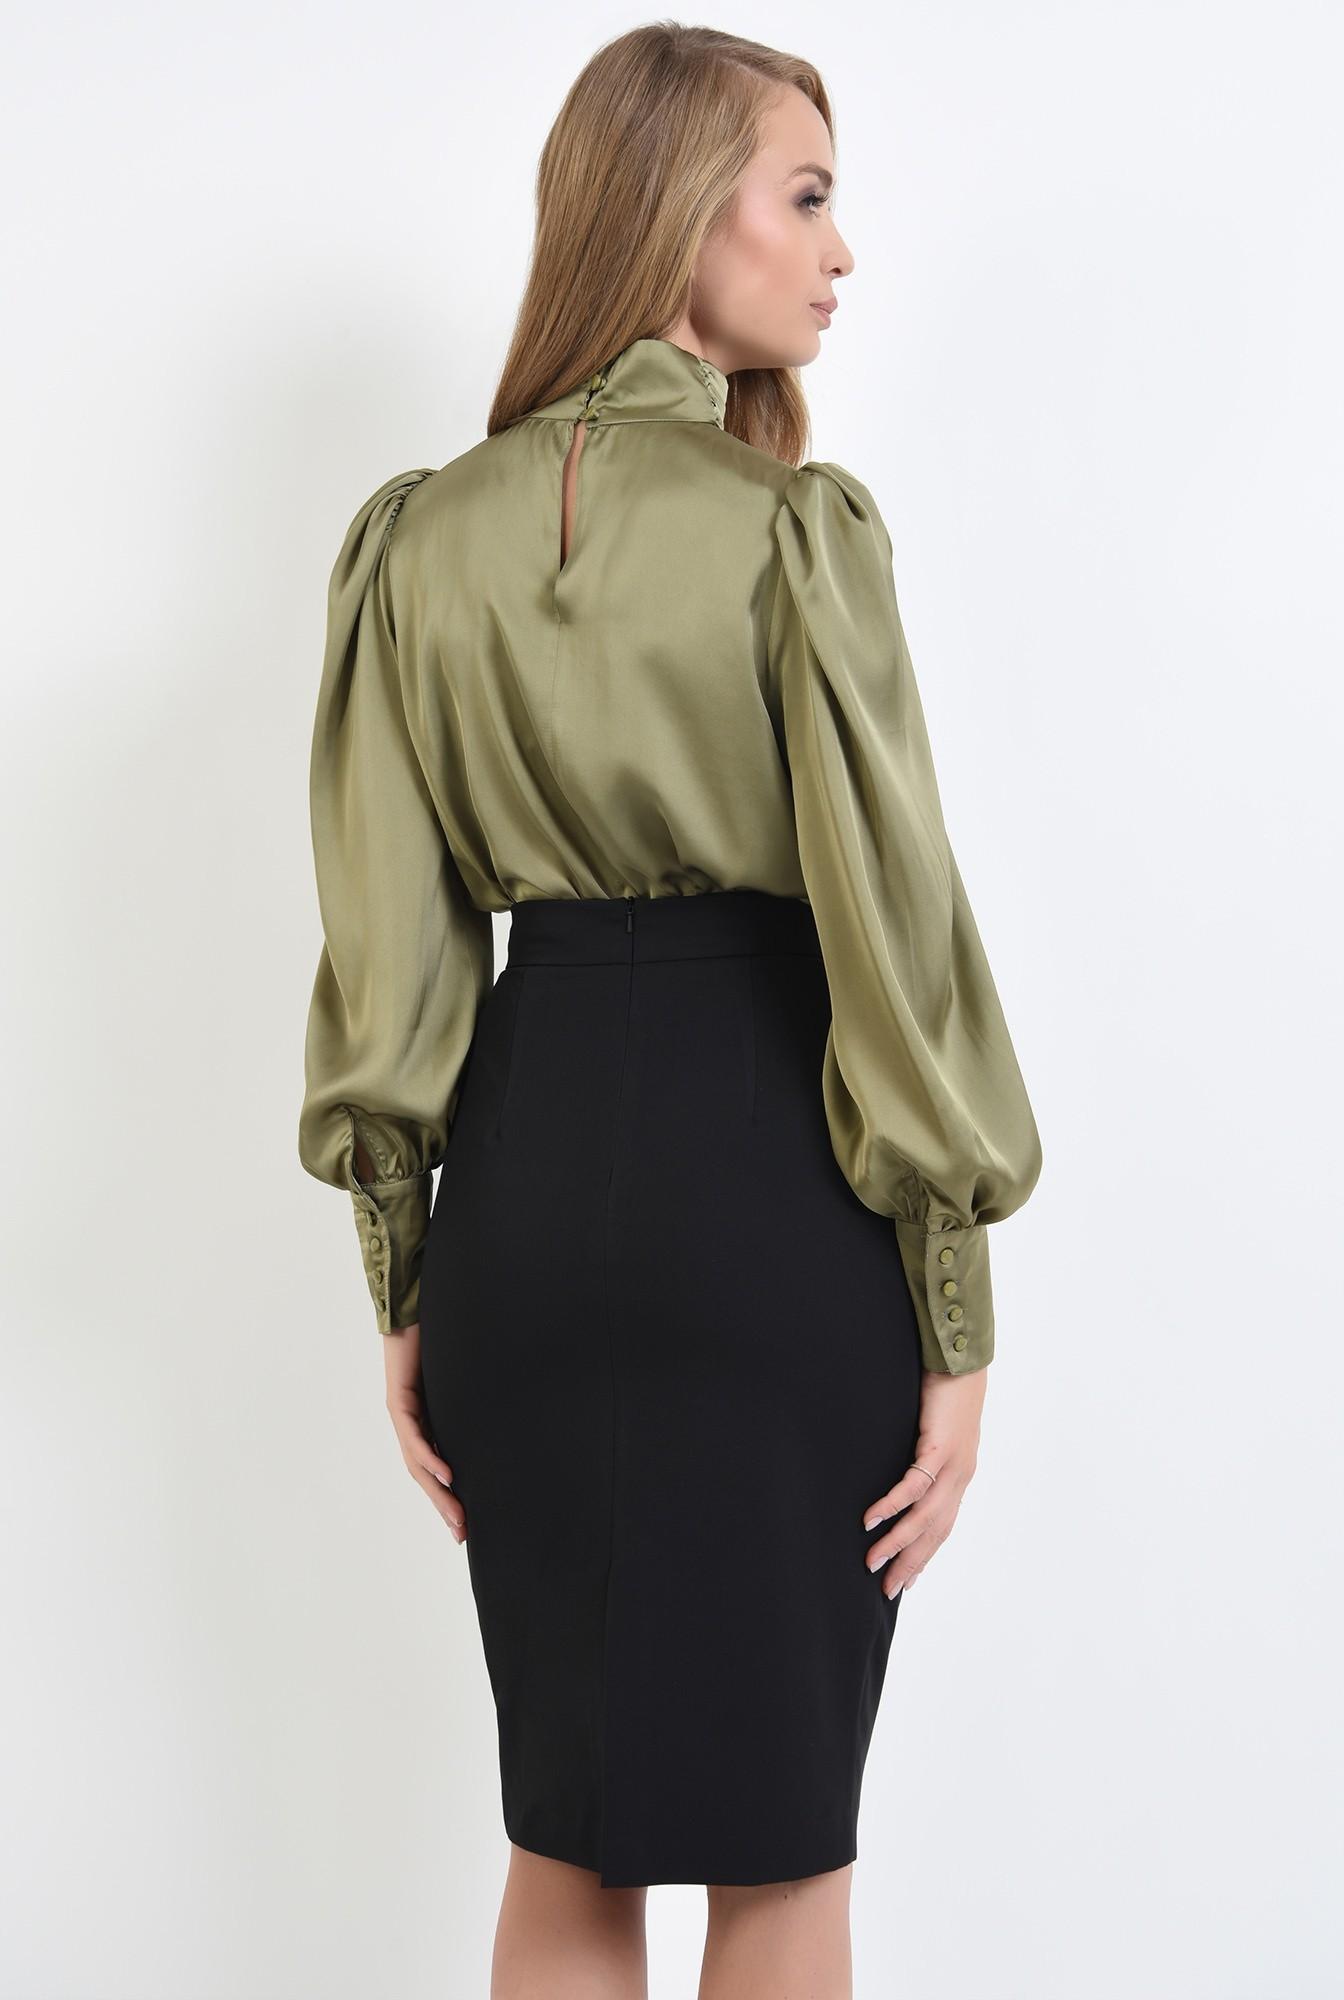 1 - 360 - bluza casual, cu umeri accentuati, cu nasturi la mansete